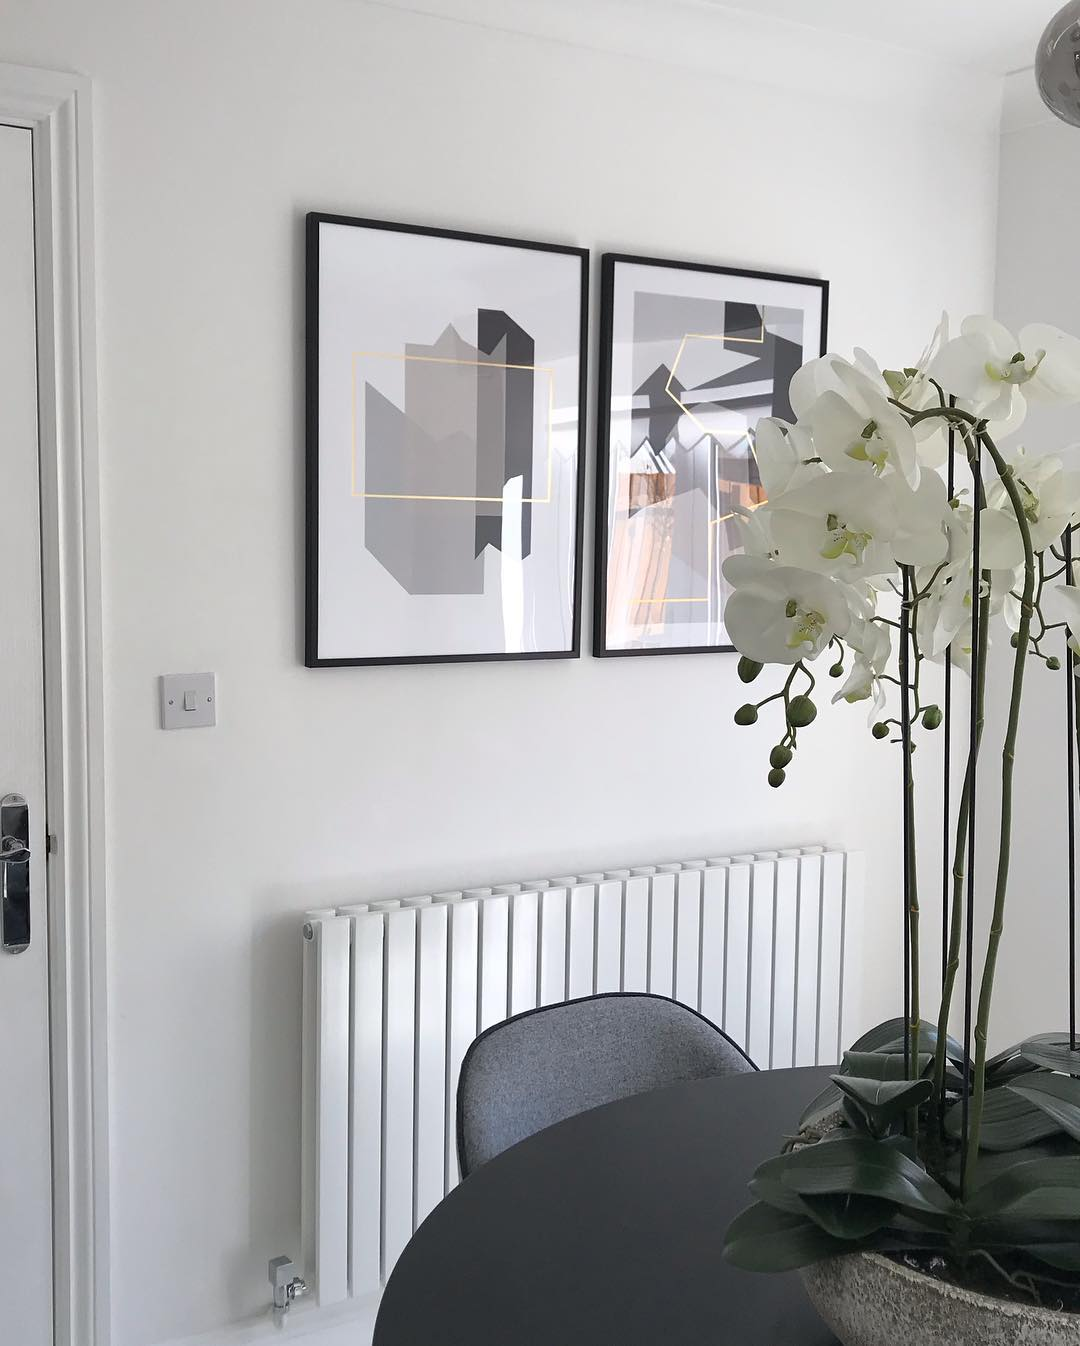 A modern Milano designer radiator